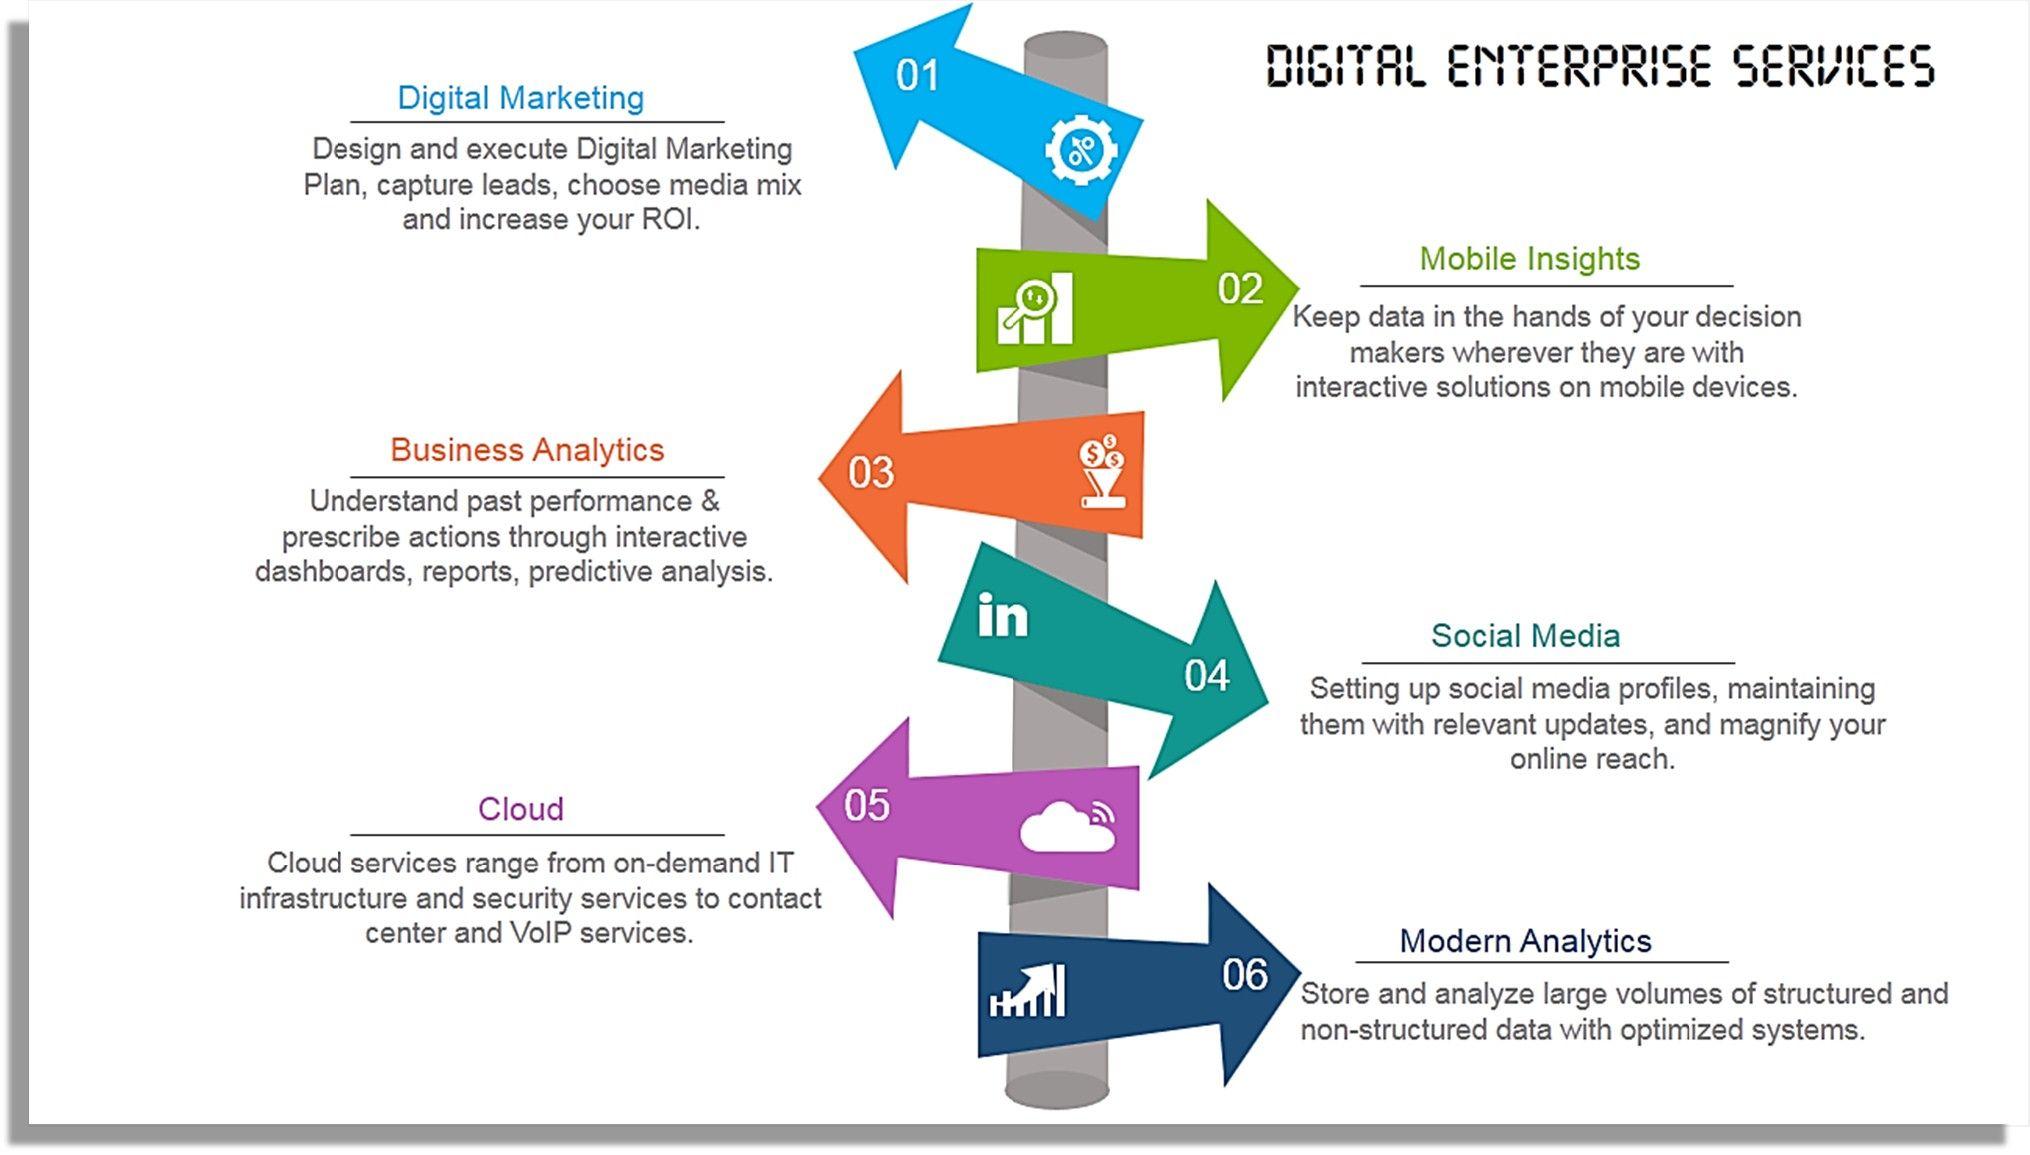 15 Ways To Turn A Very Text Heavy Bullet Ridden Slide Into Amazing Presentation Hackathon Part 3 Digital Marketing Plan Digital Marketing Design Digital Enterprise